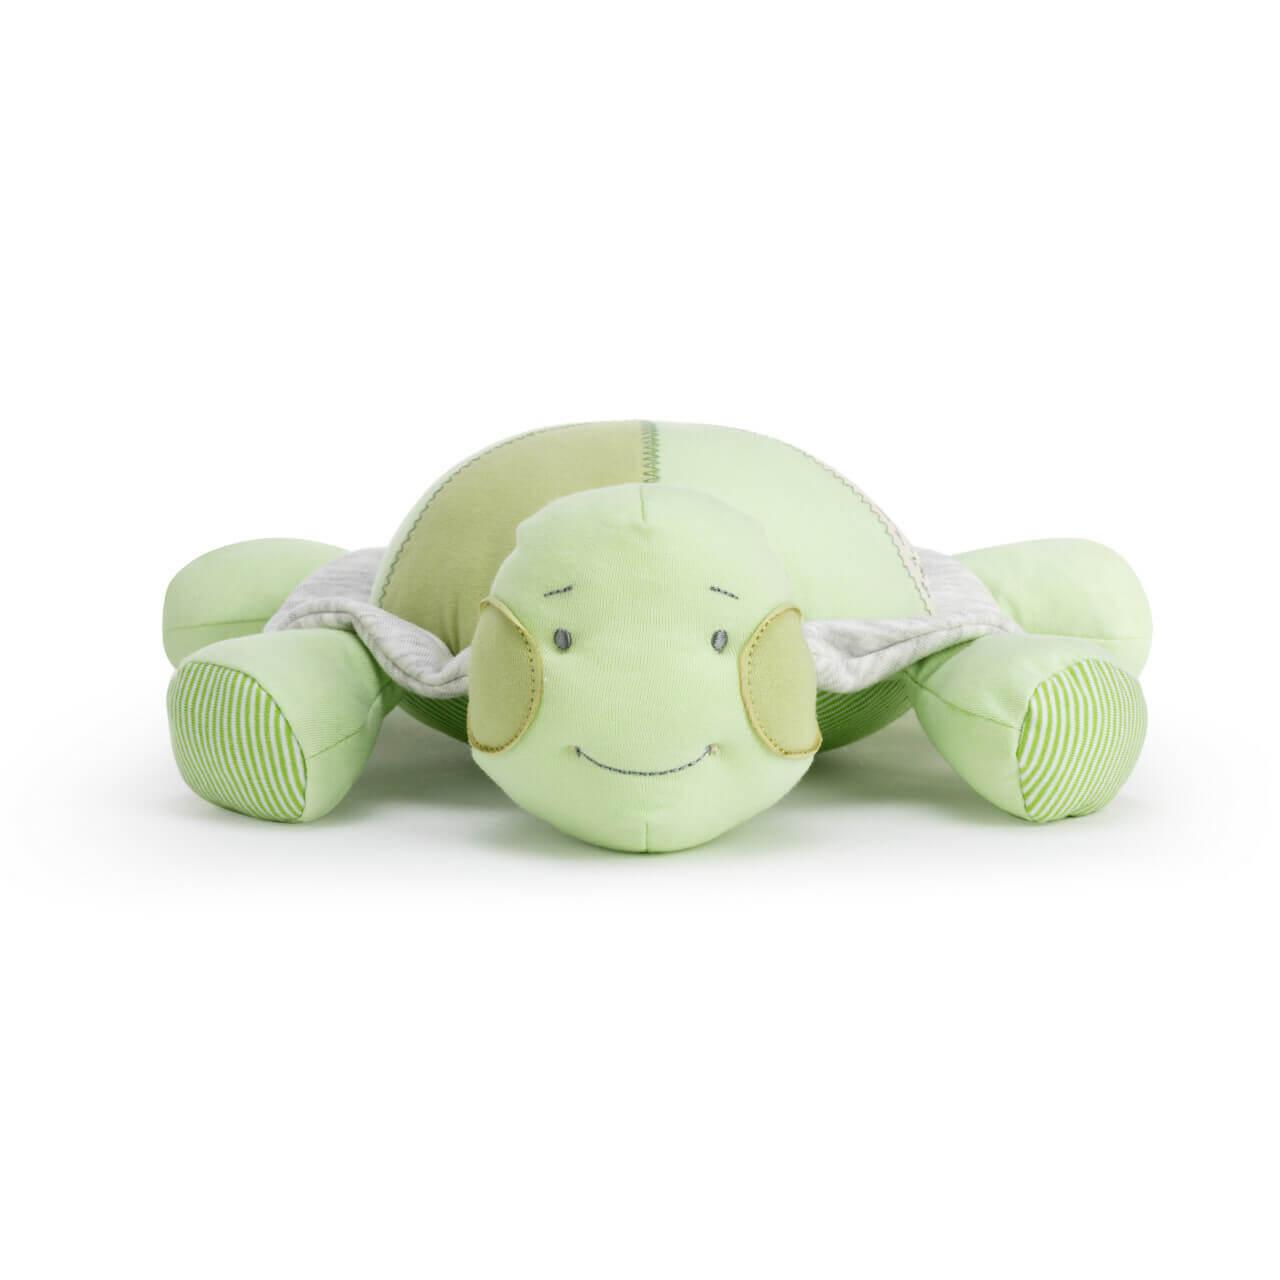 Demdaco grow slow green turtle plush